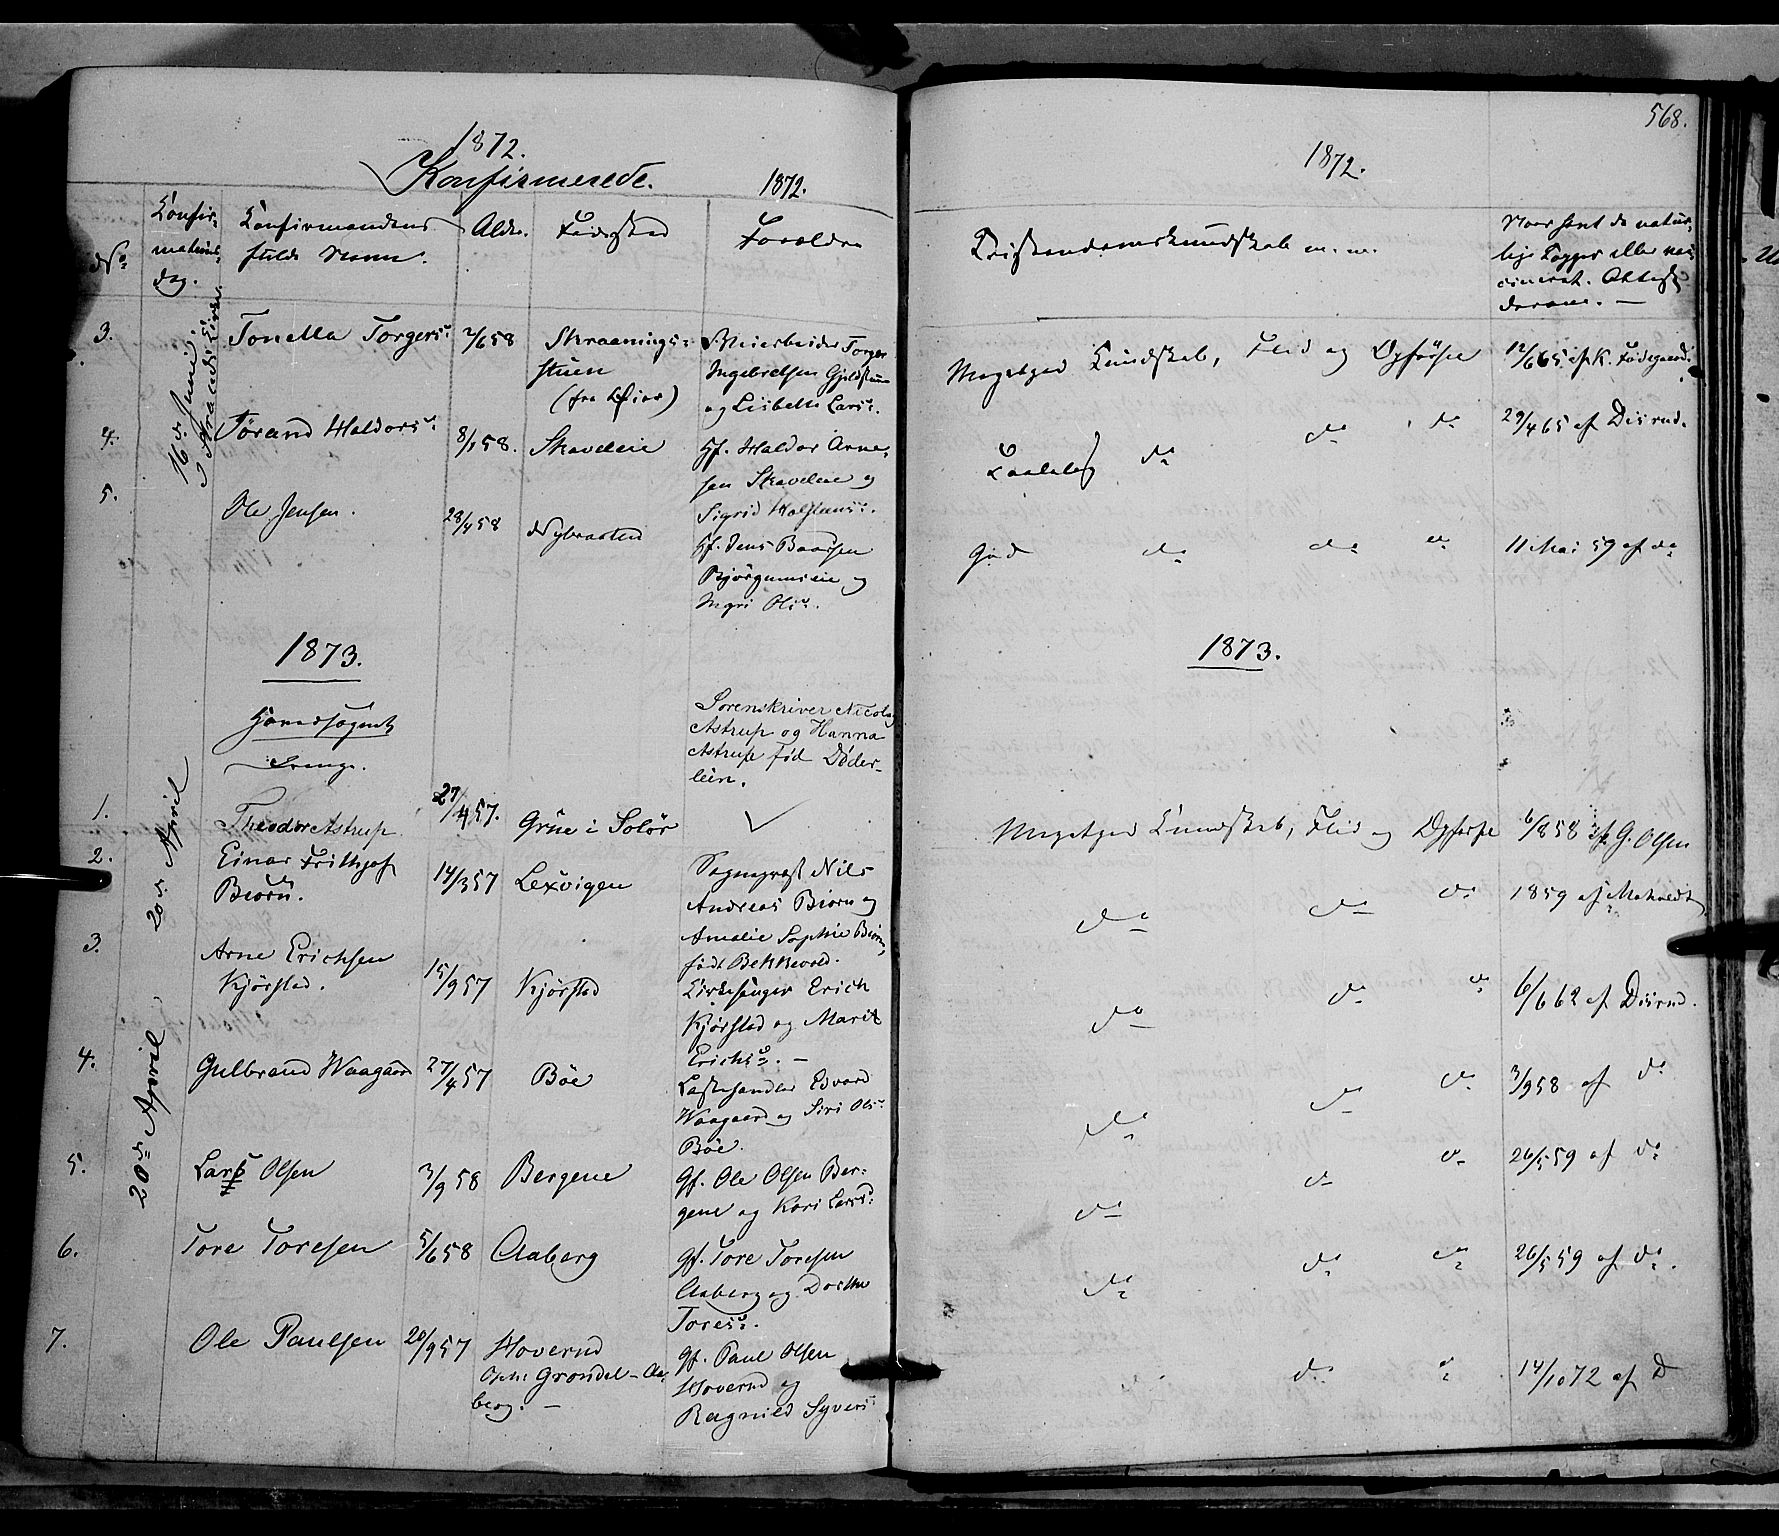 SAH, Nord-Aurdal prestekontor, Ministerialbok nr. 8, 1863-1875, s. 568